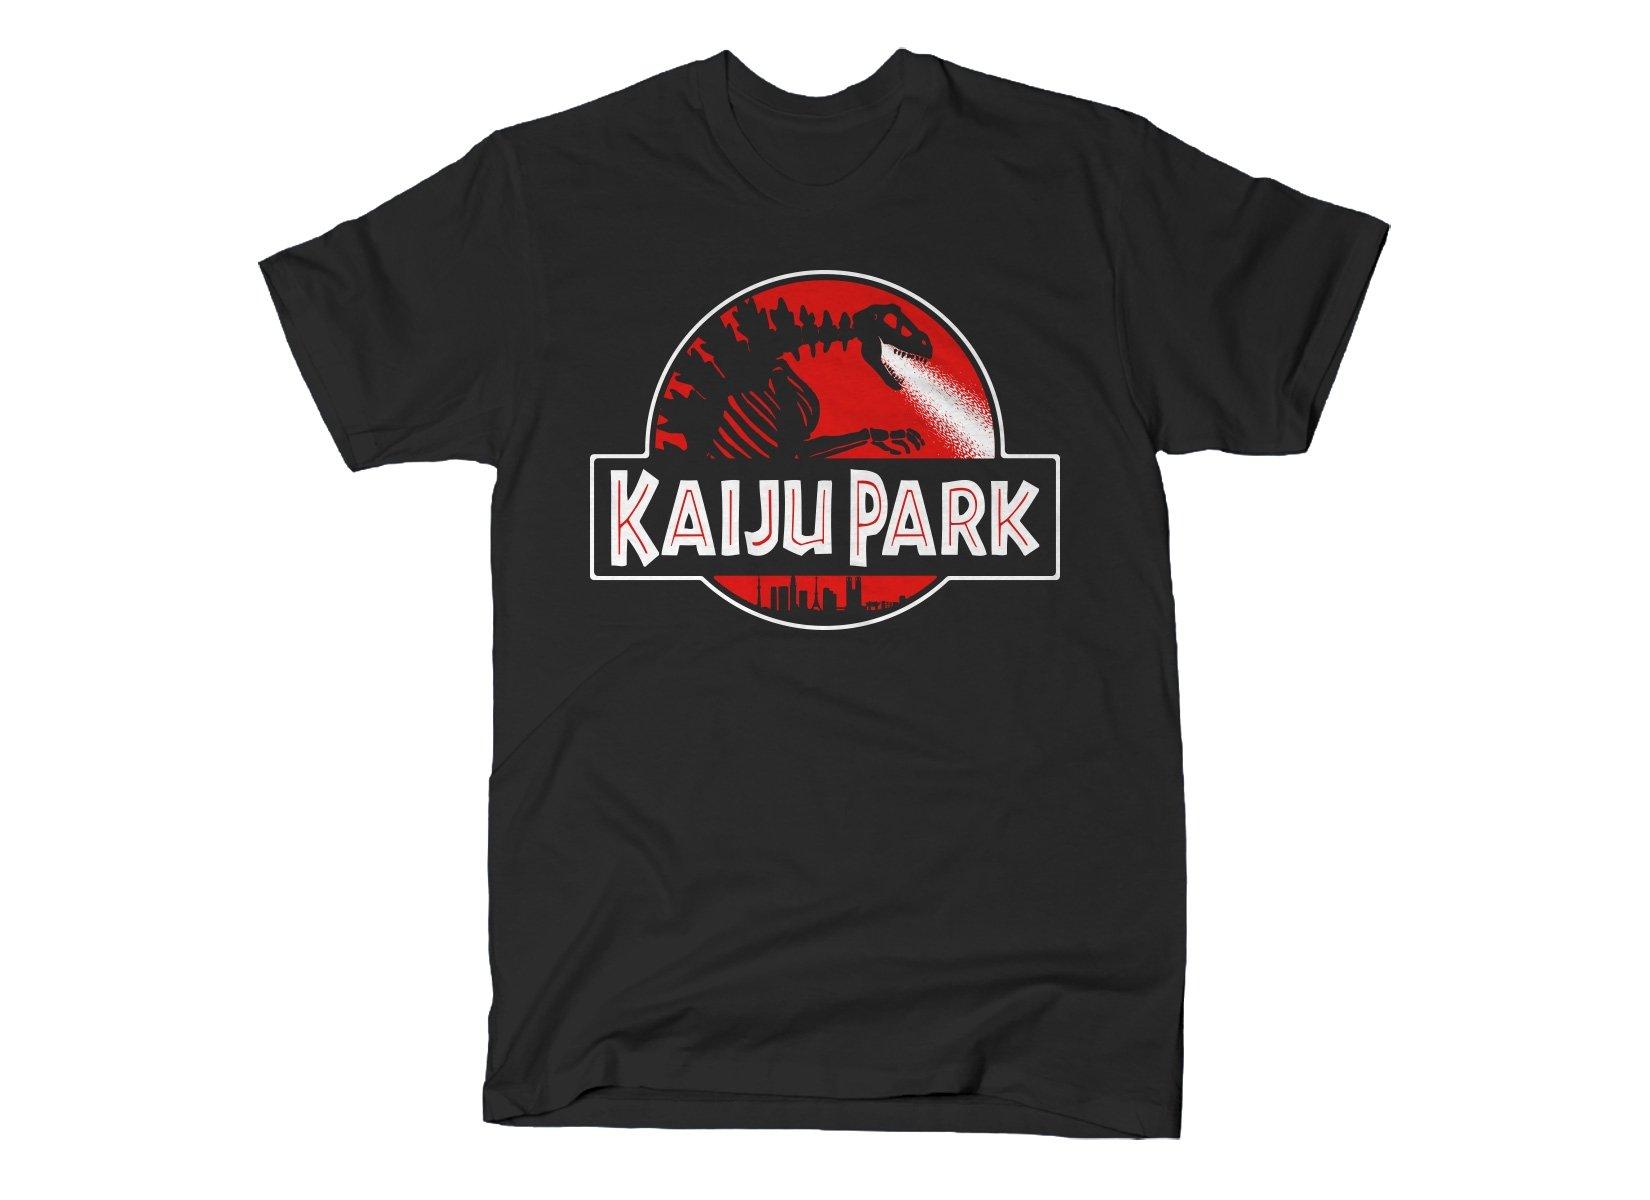 Kaiju Park on Mens T-Shirt